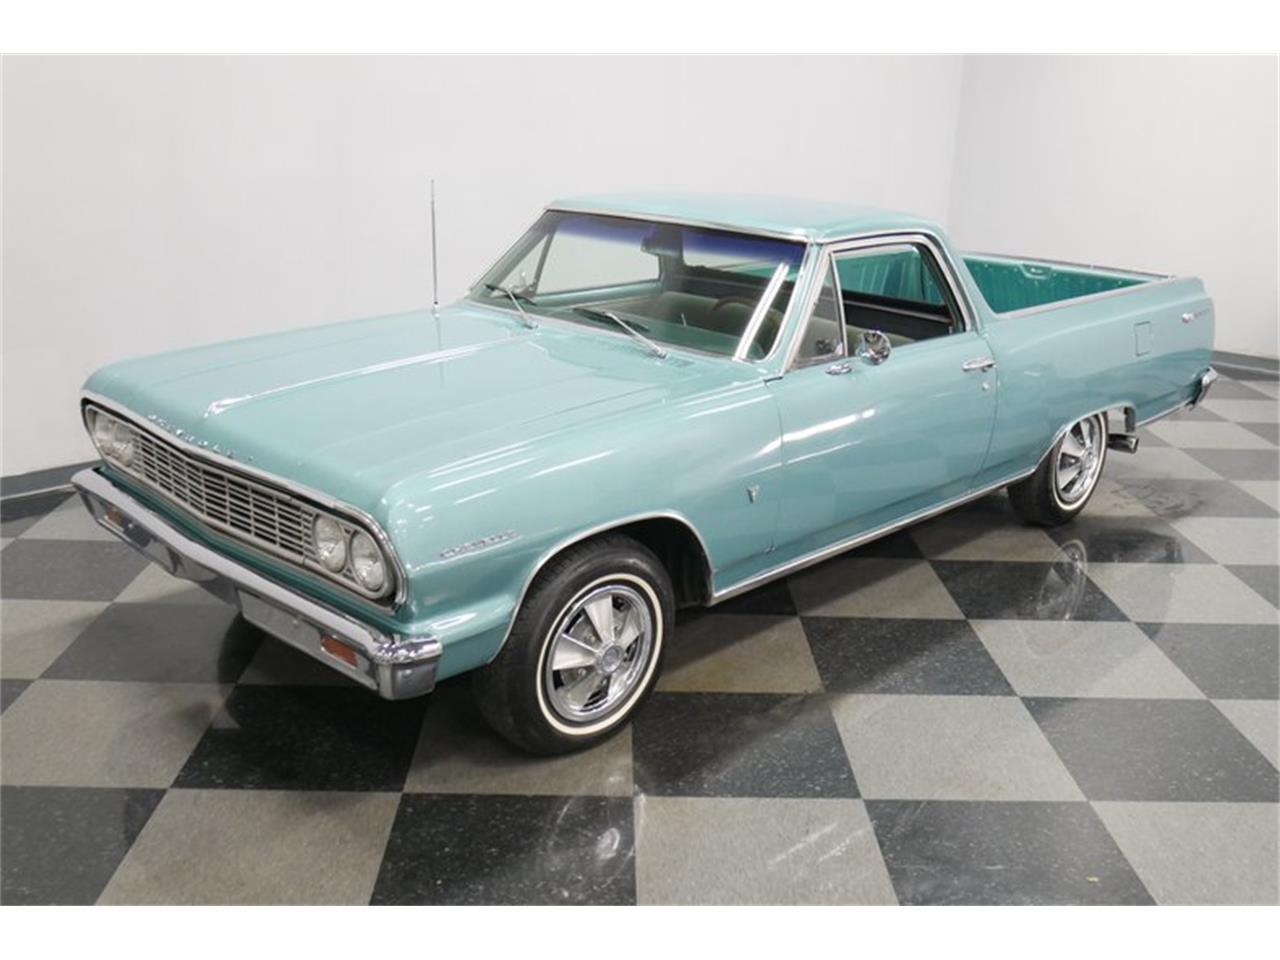 1964 Chevrolet El Camino (CC-1236502) for sale in Lavergne, Tennessee